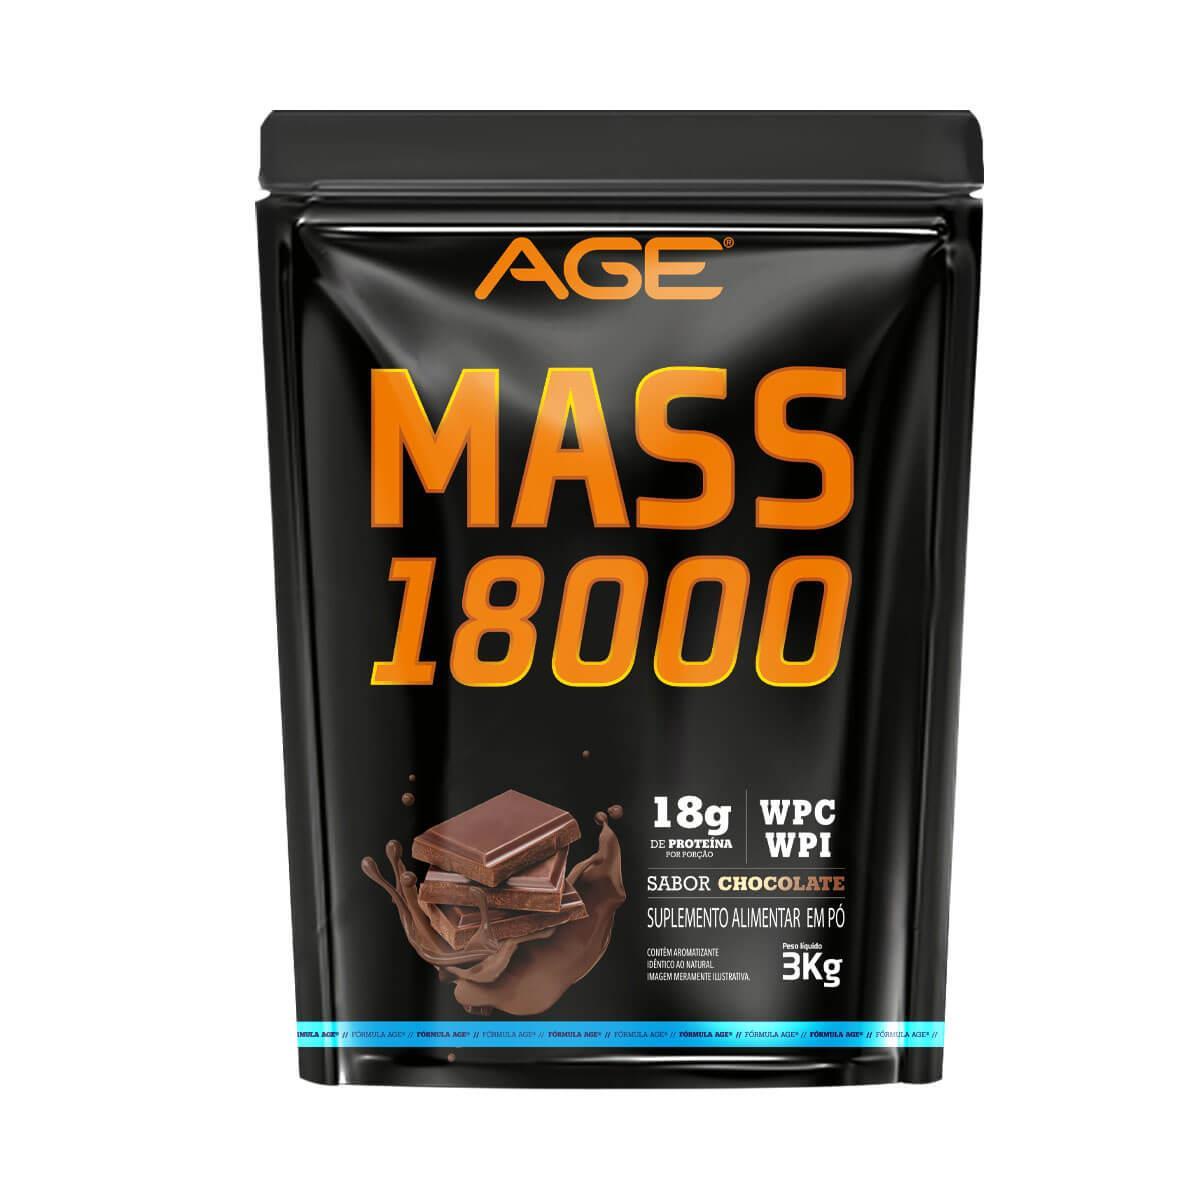 MASS 18000 (3Kg) - Chocolate - AGE